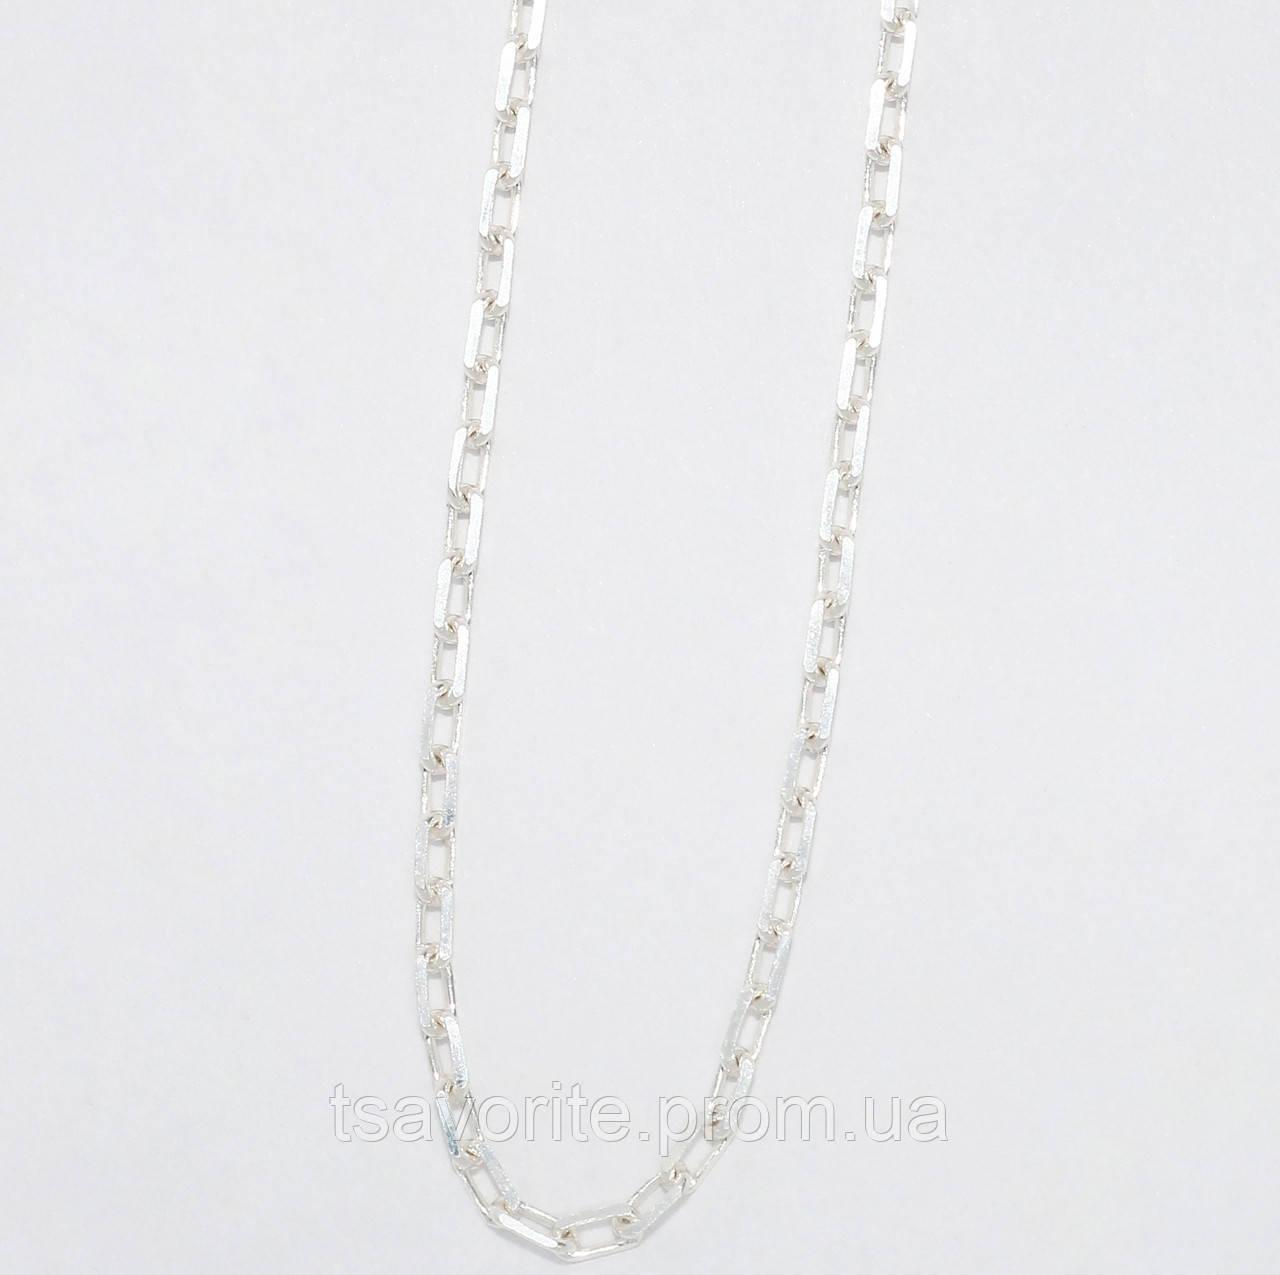 Серебряная цепочка 10326(0506)